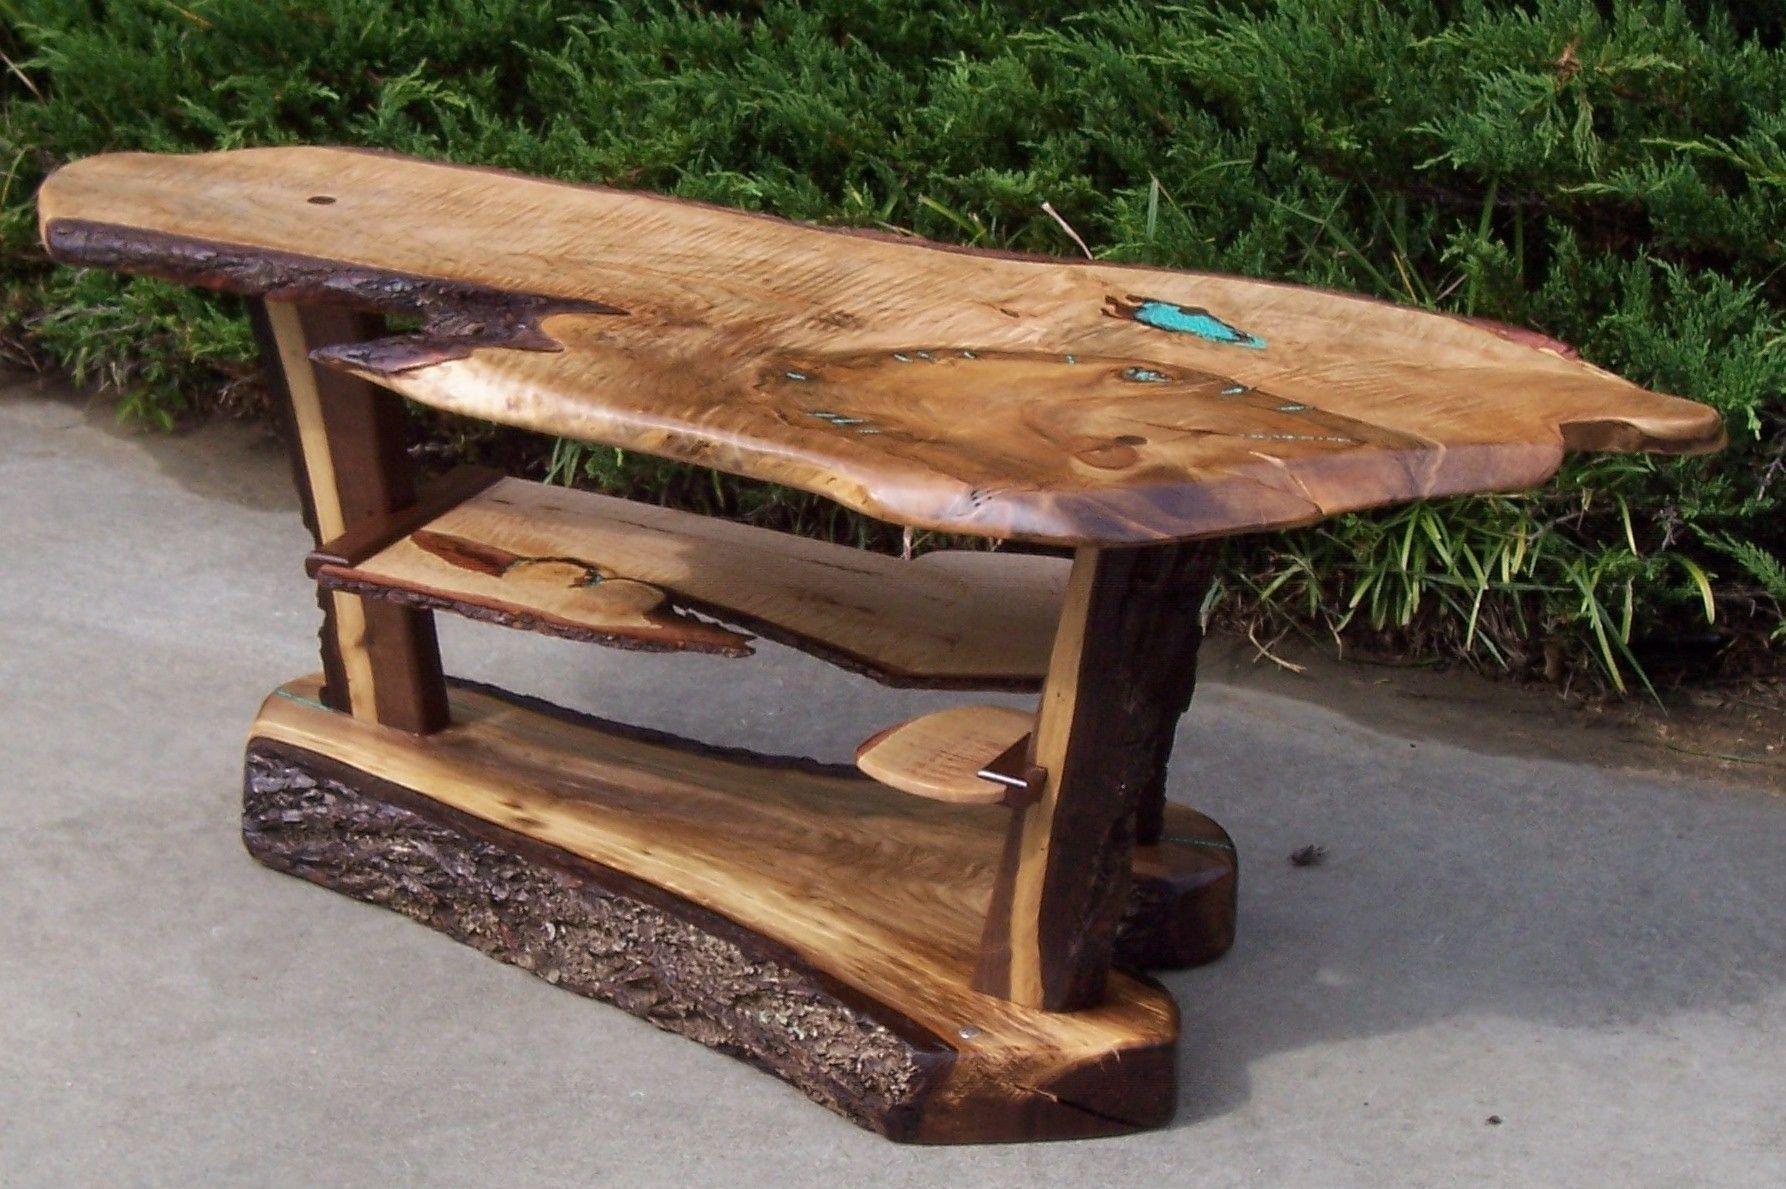 Live Edge Coffee Table Rustic Wood Furniture Wood Table Design Live Edge Coffee Table [ 1189 x 1786 Pixel ]